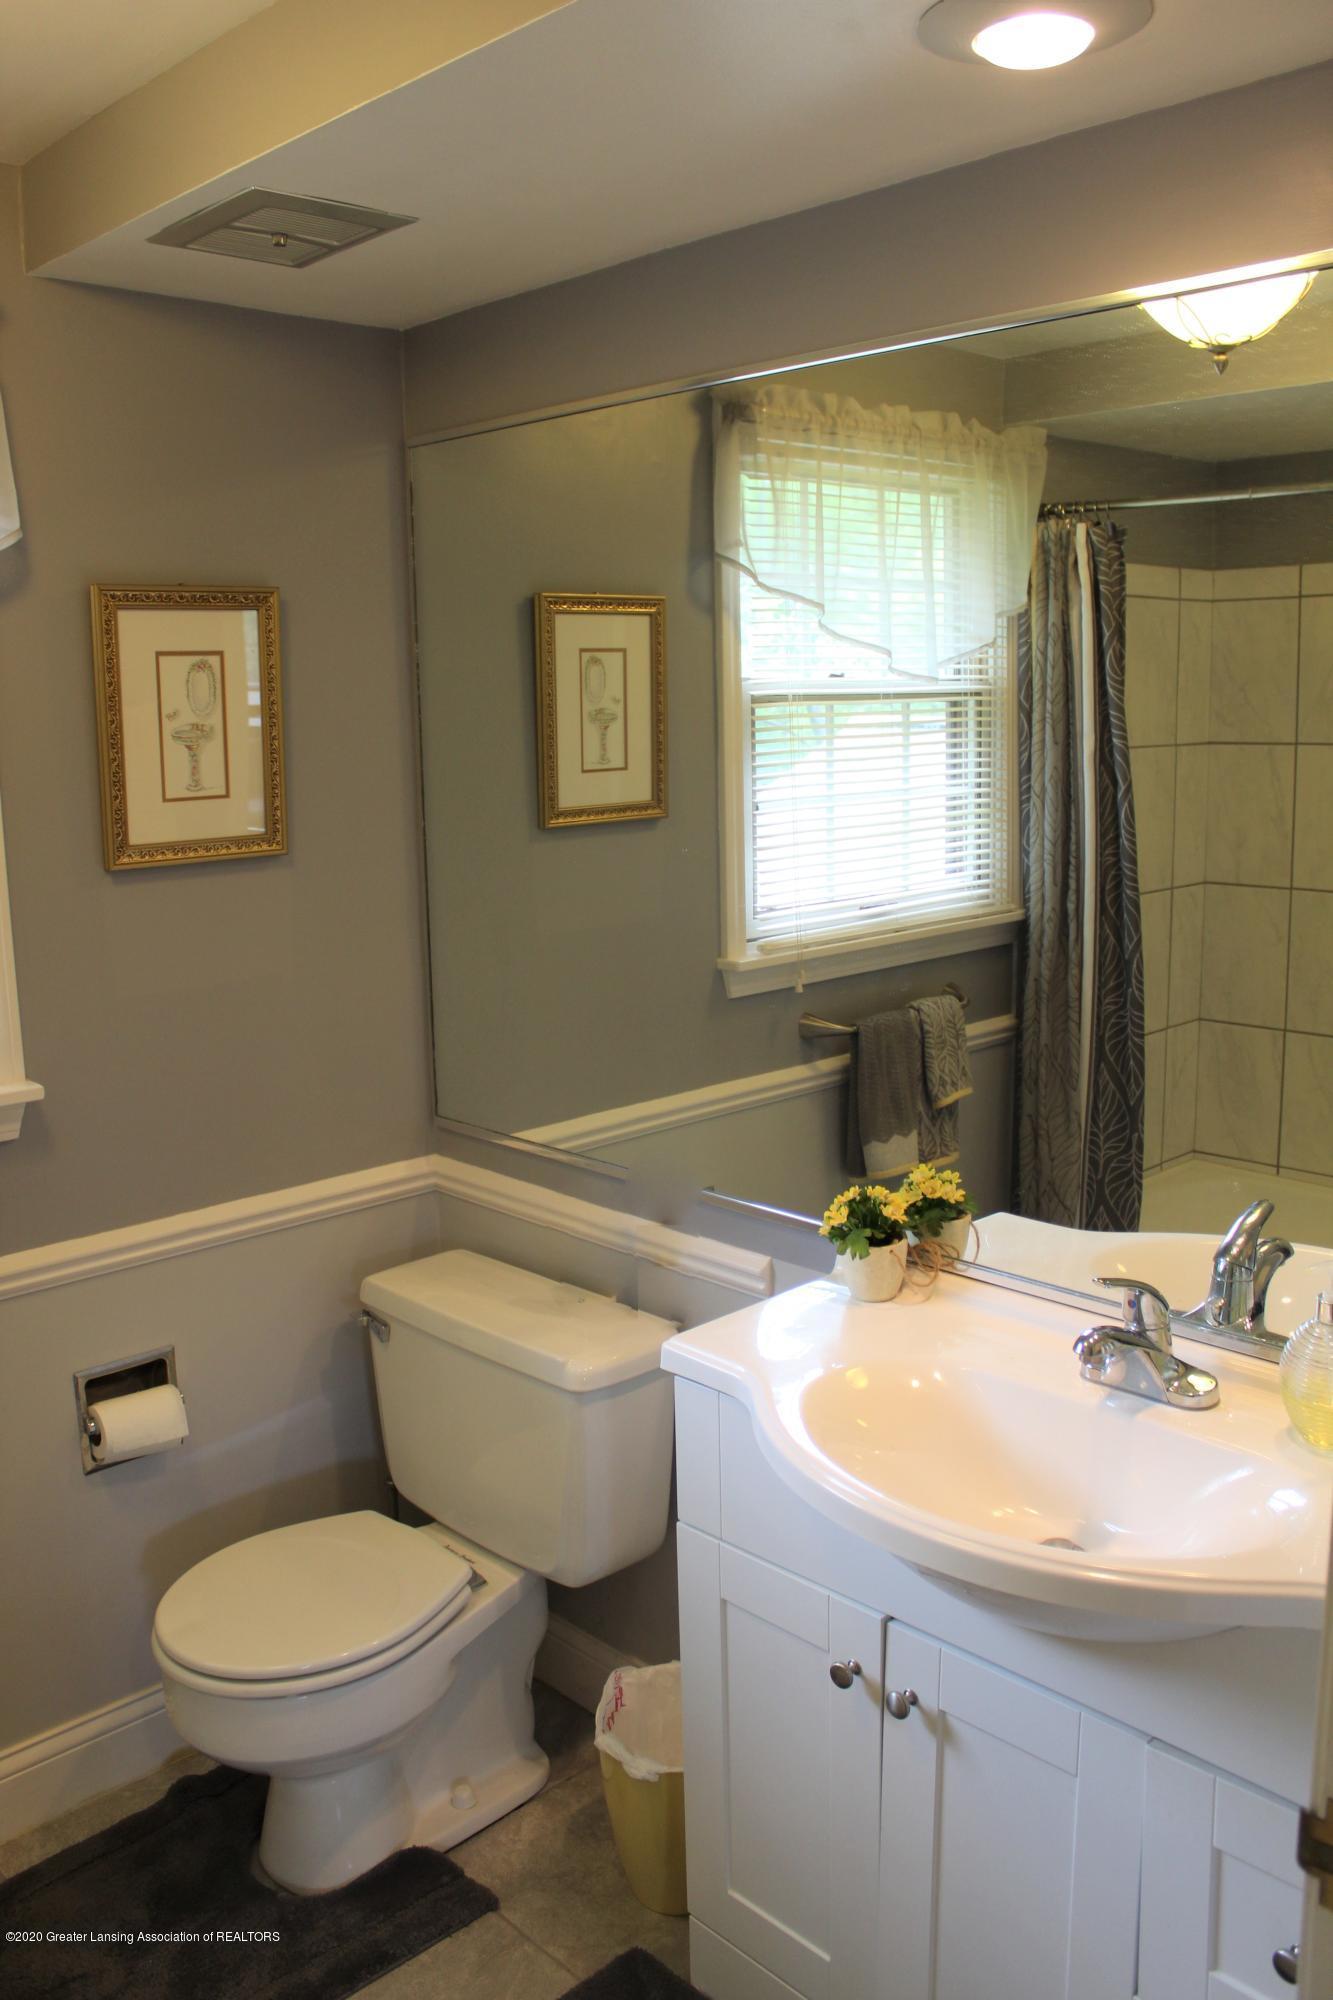 3599 W Arbutus Dr - 2nd Floor Full Bath - 33